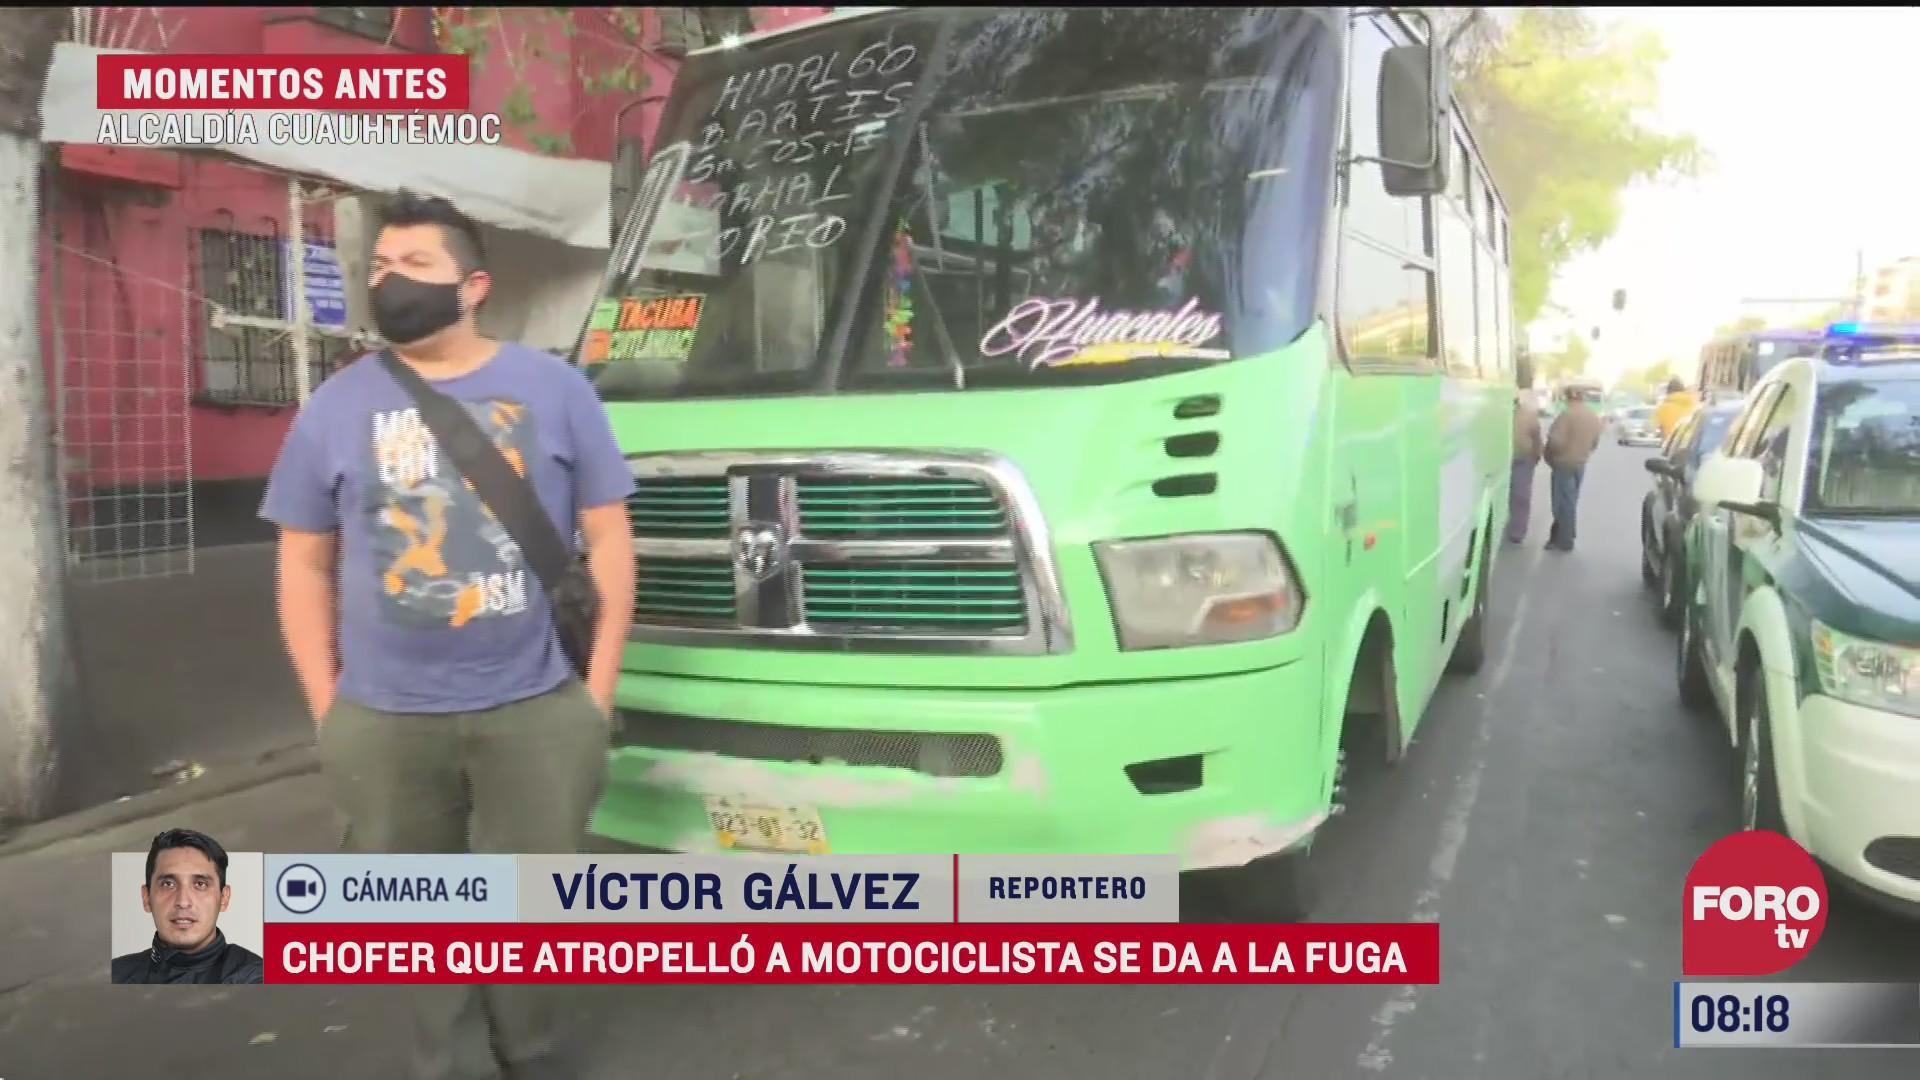 camion de transporte publico arrolla a motociclista en cdmx